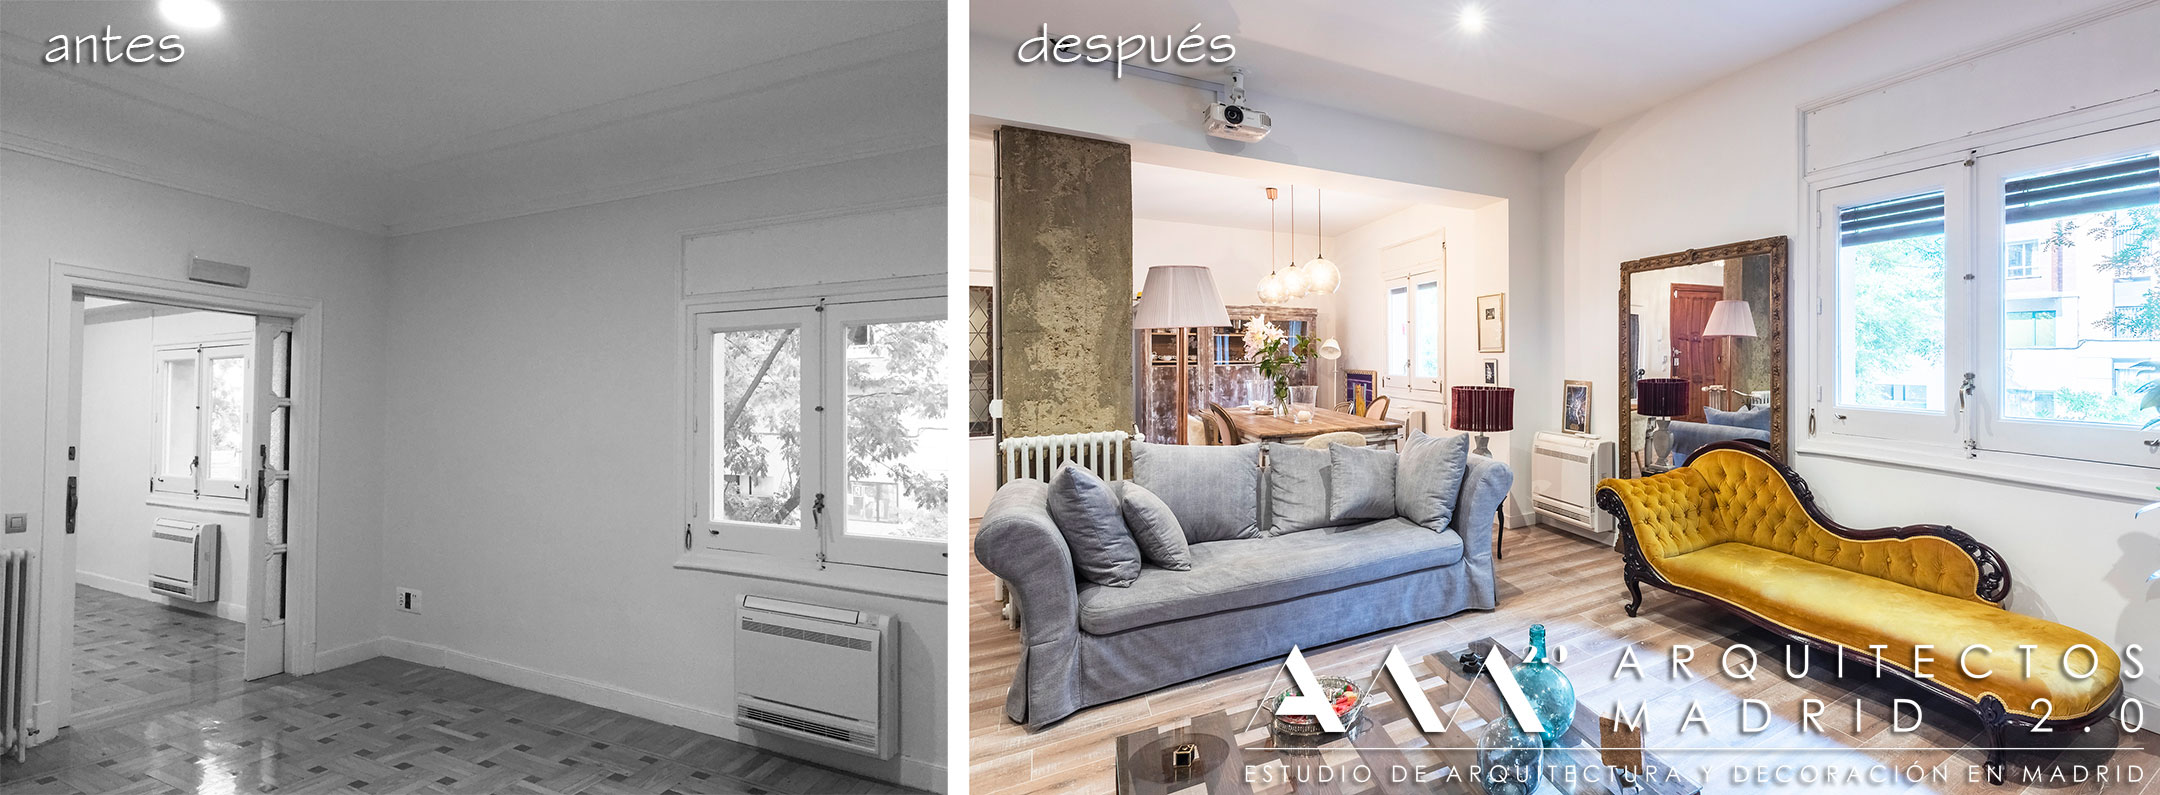 decoracion-reforma-integral-piso-arquitectos-madrid